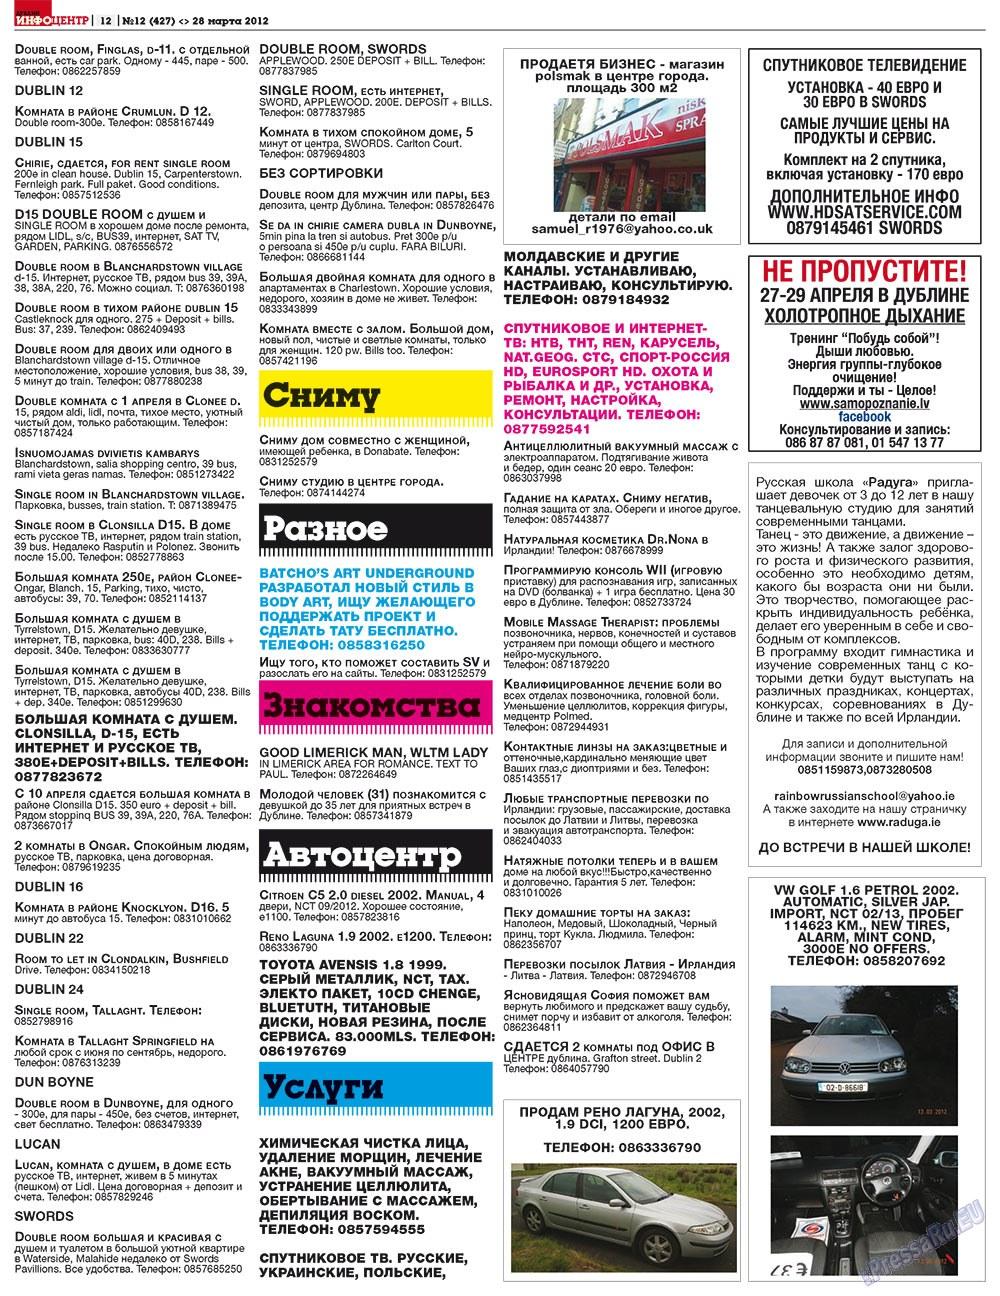 Дублин инфоцентр (газета). 2012 год, номер 12, стр. 12